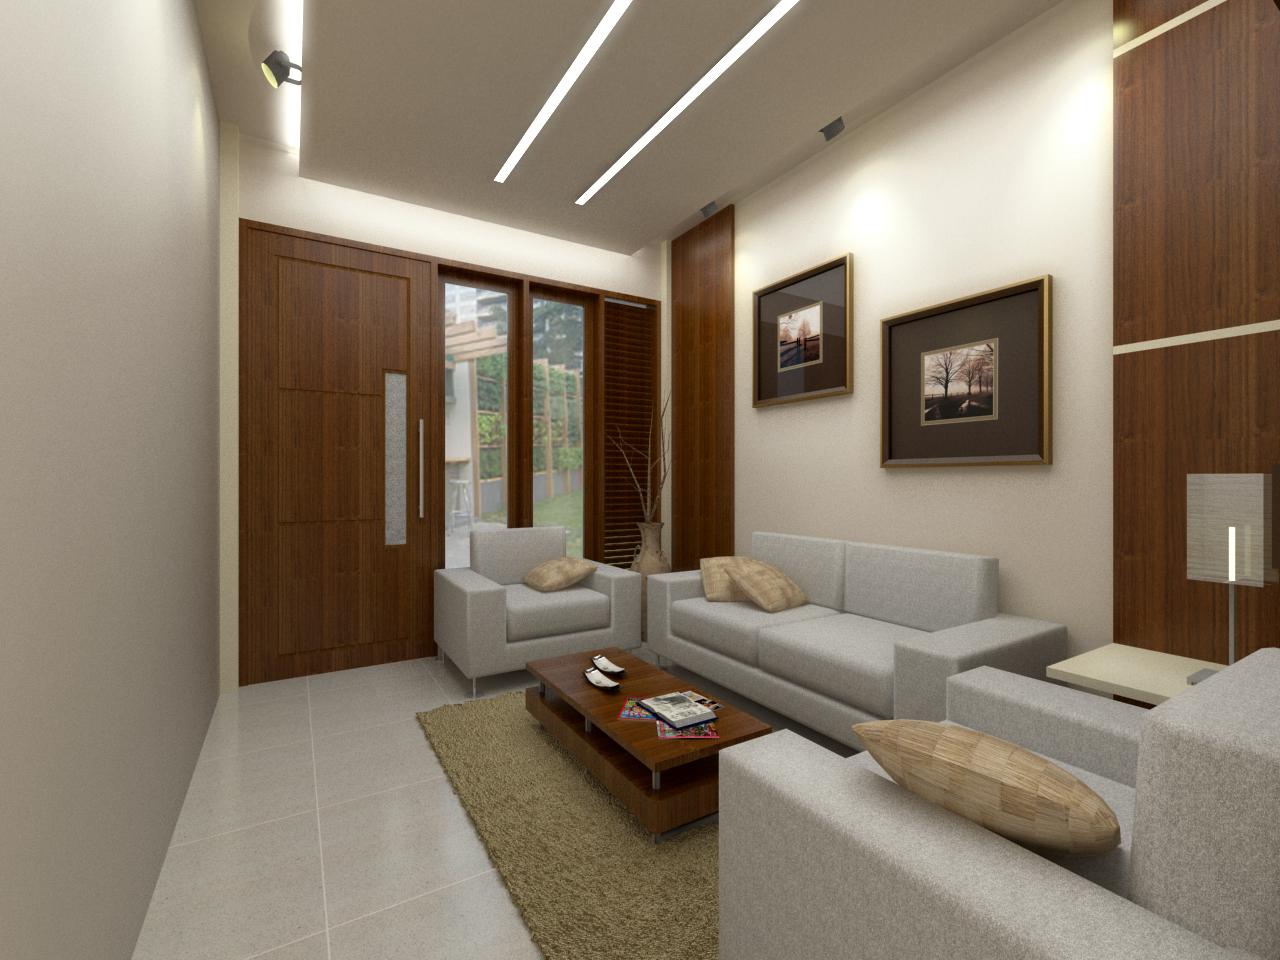 padu padan warna cokelat dan abu abu untuk rumah indahmu » Inilah 15 Desain Ruang Tamu yang Membuat Semuanya Lupa Waktu